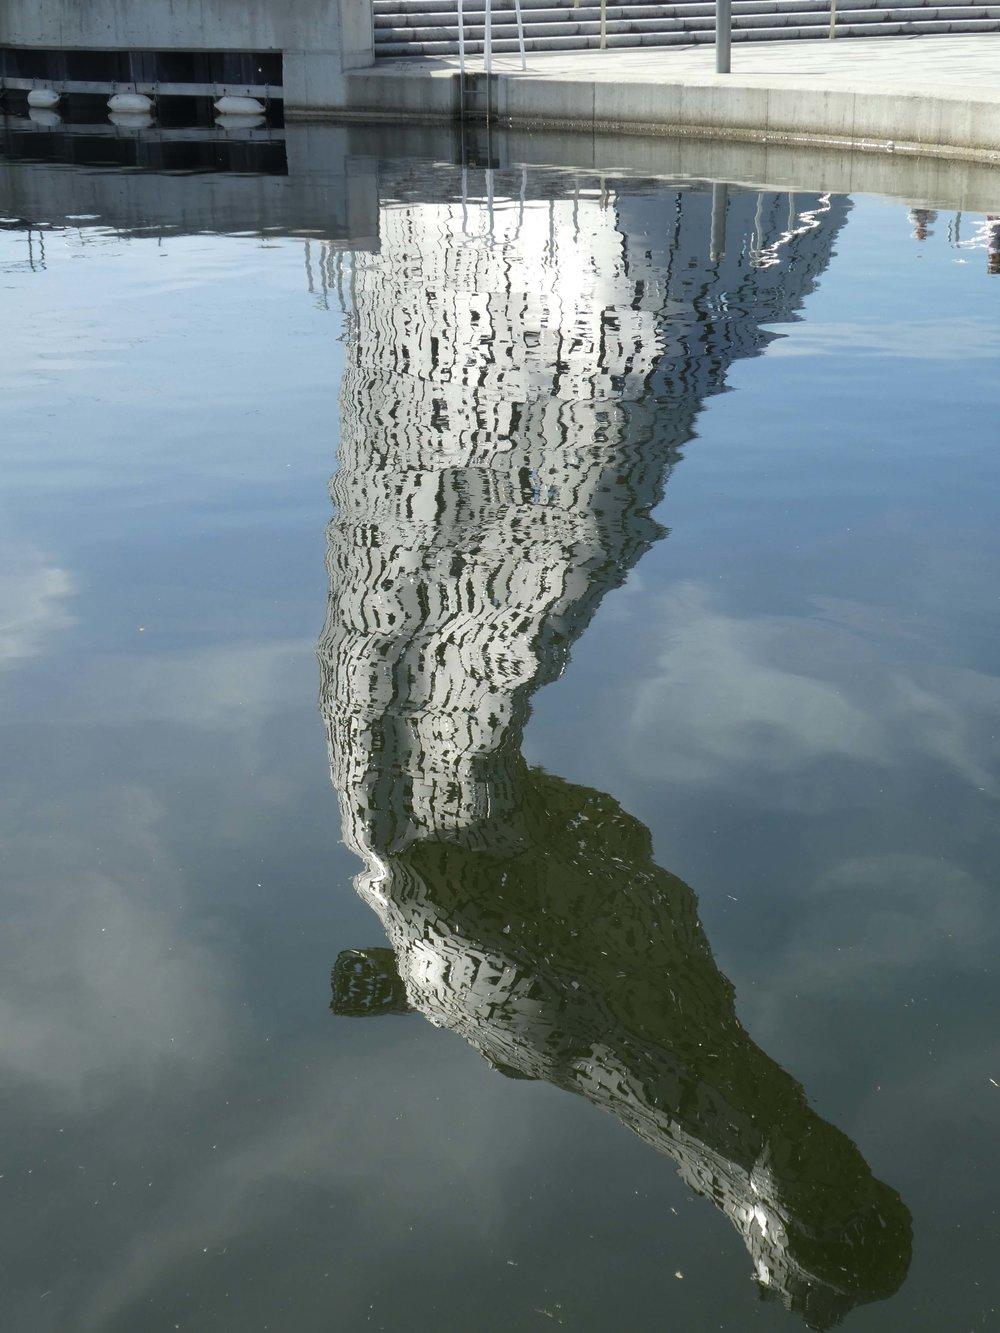 Reflecting on a Kelpie